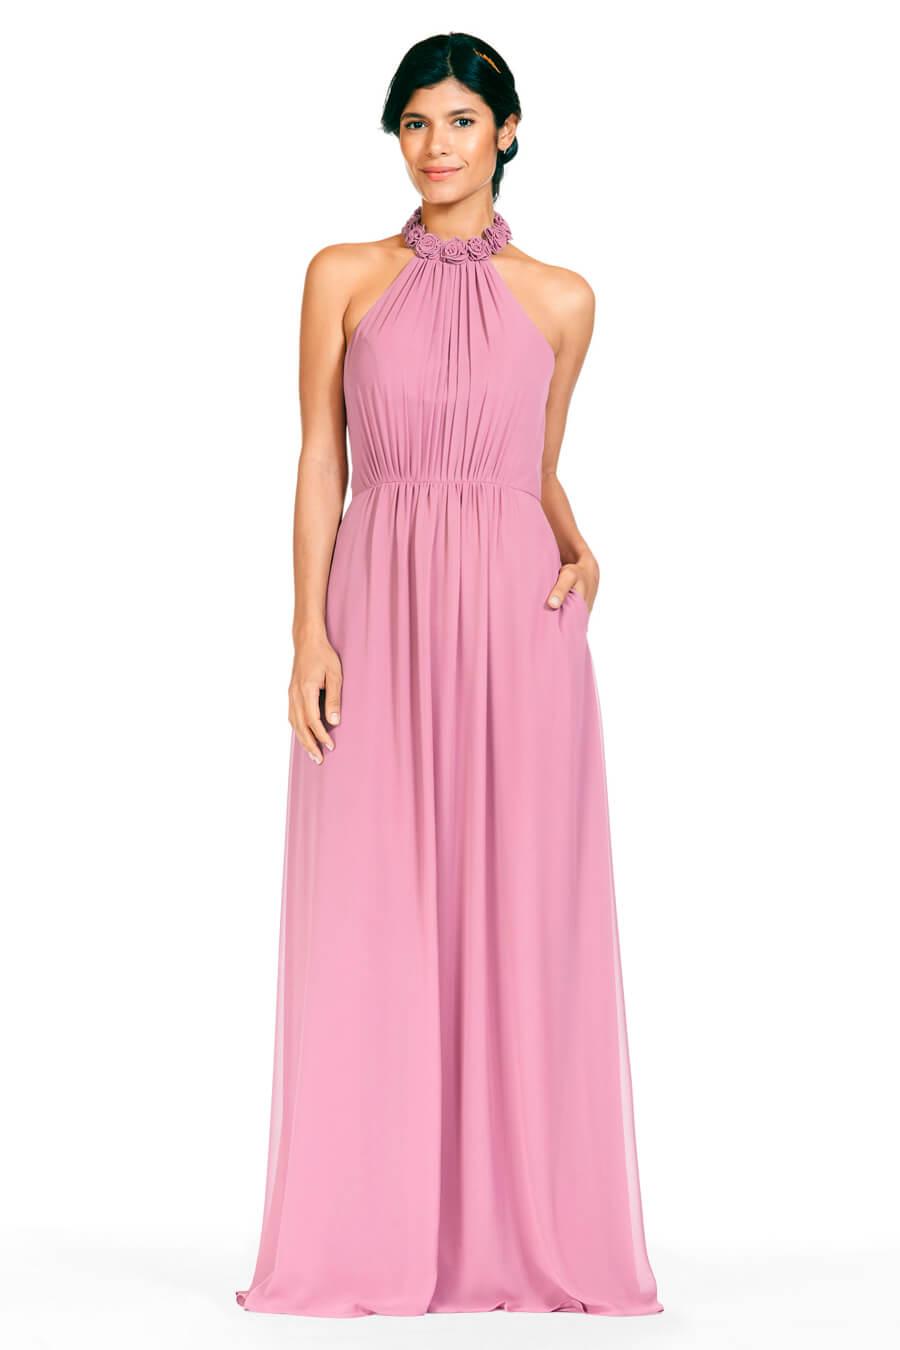 Bari jay bridesmaids bridesmaid dresses prom dresses formal select options ombrellifo Gallery